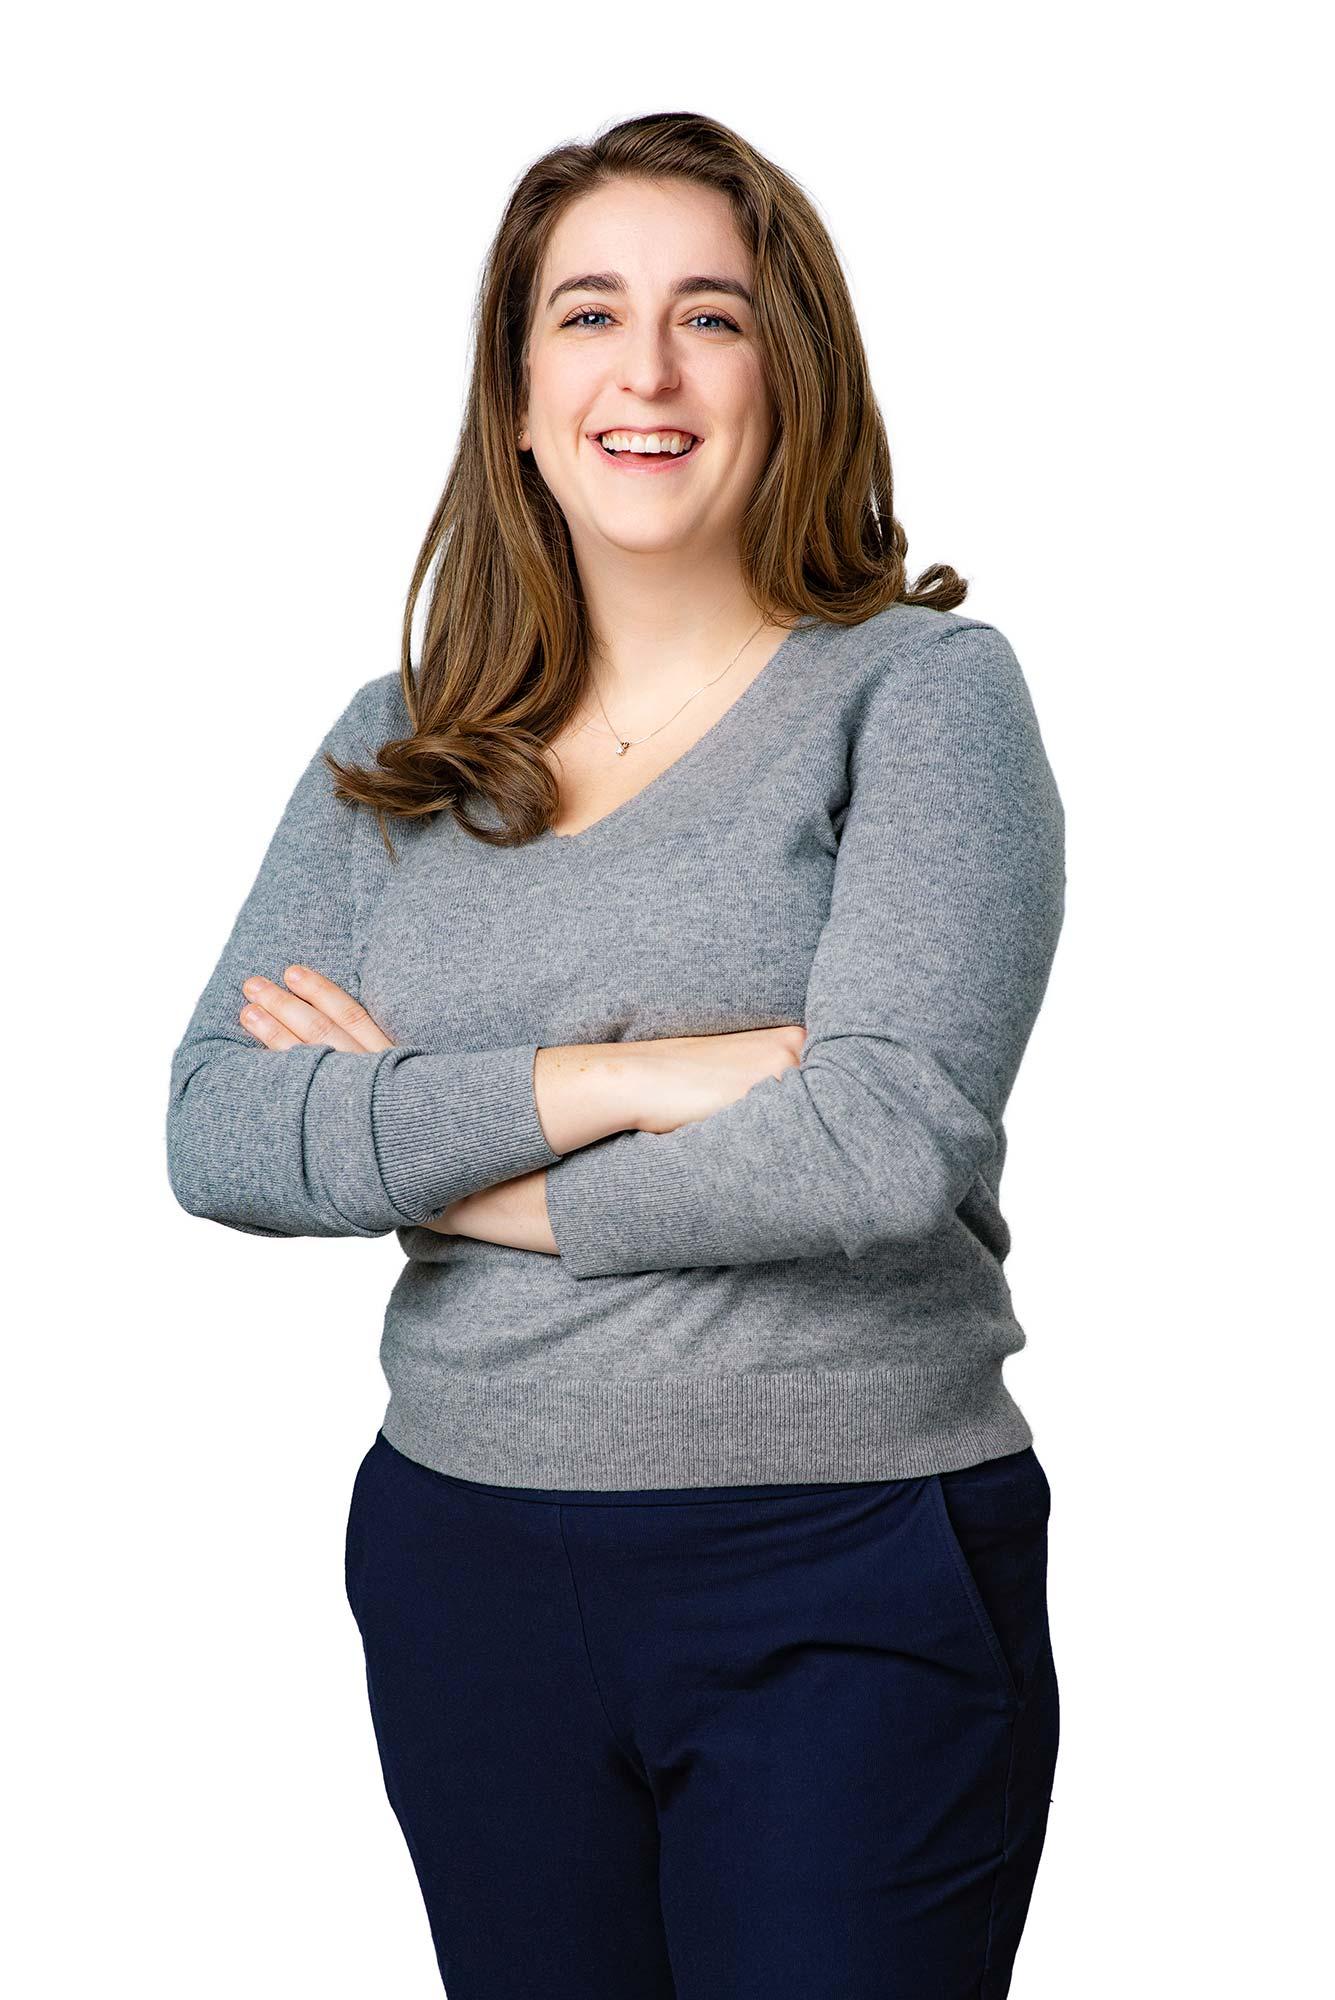 Laura Goodman PE Project Manager Schaefer